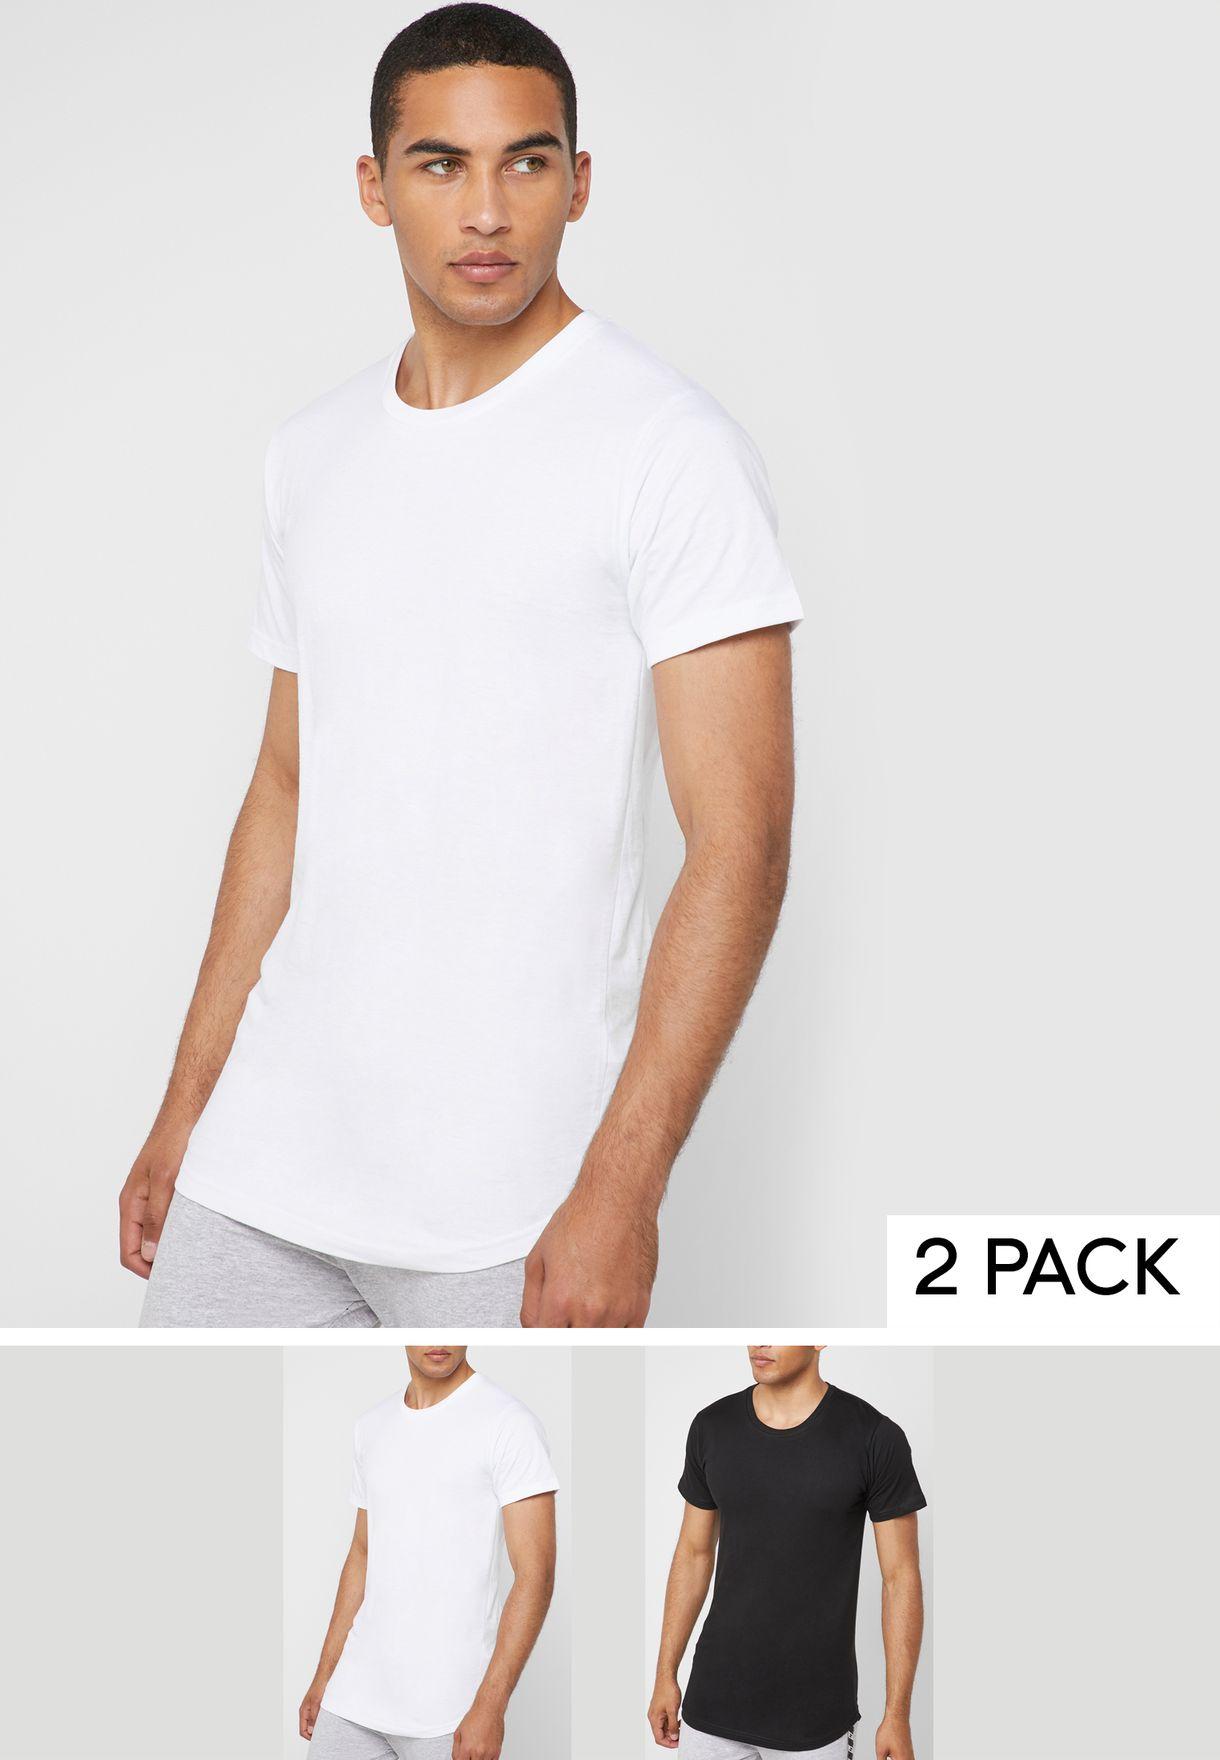 af7f84d7 Shop Fifteen Minutes multicolor 2 Pack Longline T-Shirts LL-Tshirt ...